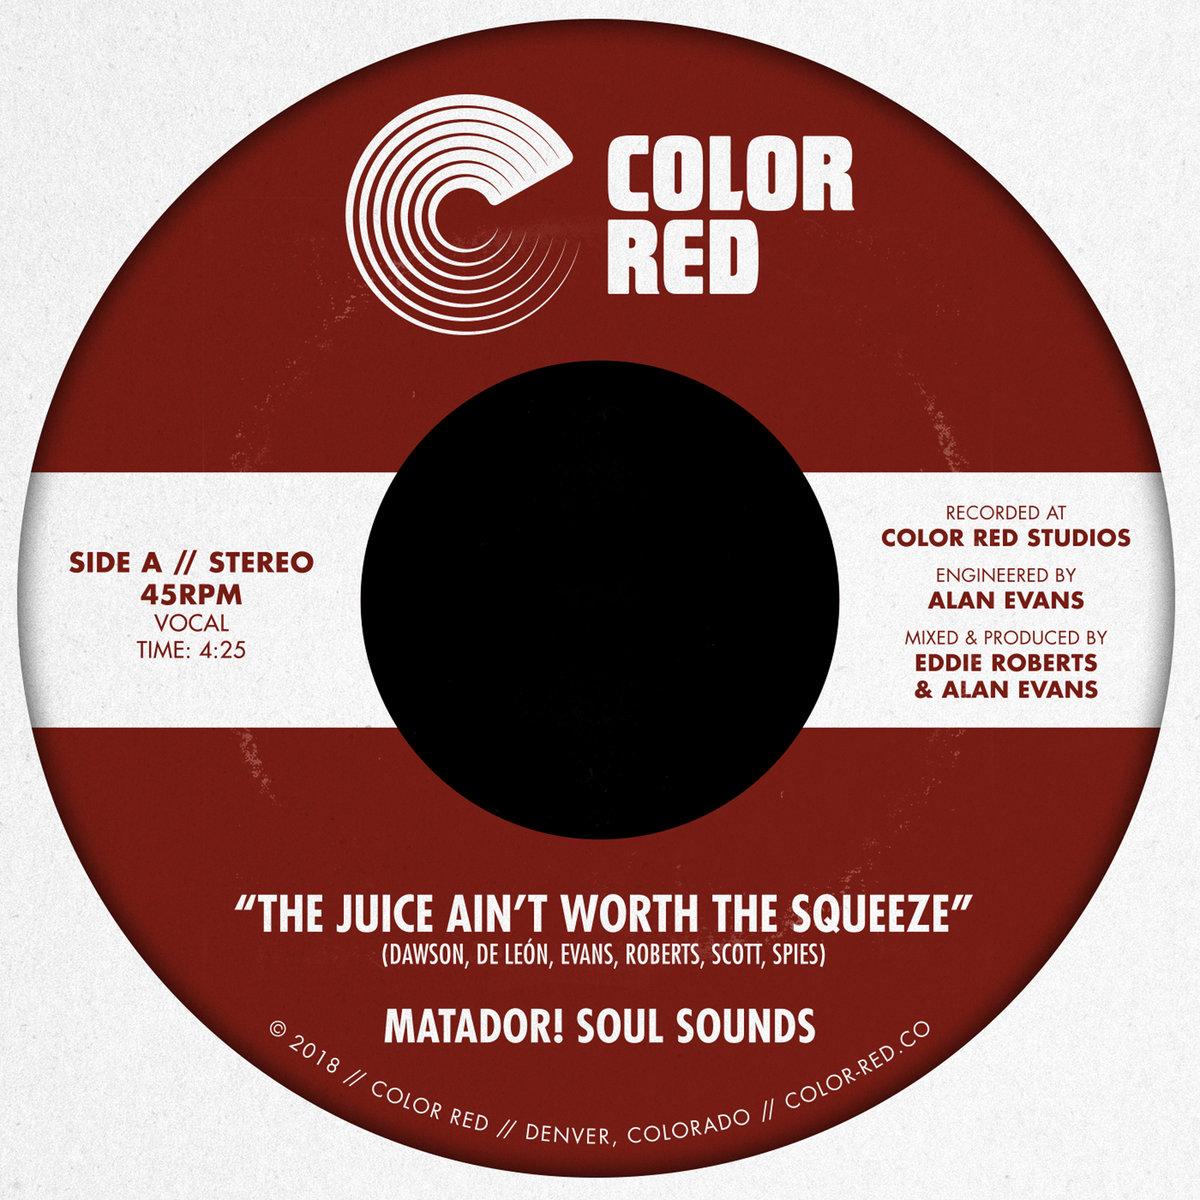 The Juice Ain't Worth the Squeeze   Matador! Soul Sounds